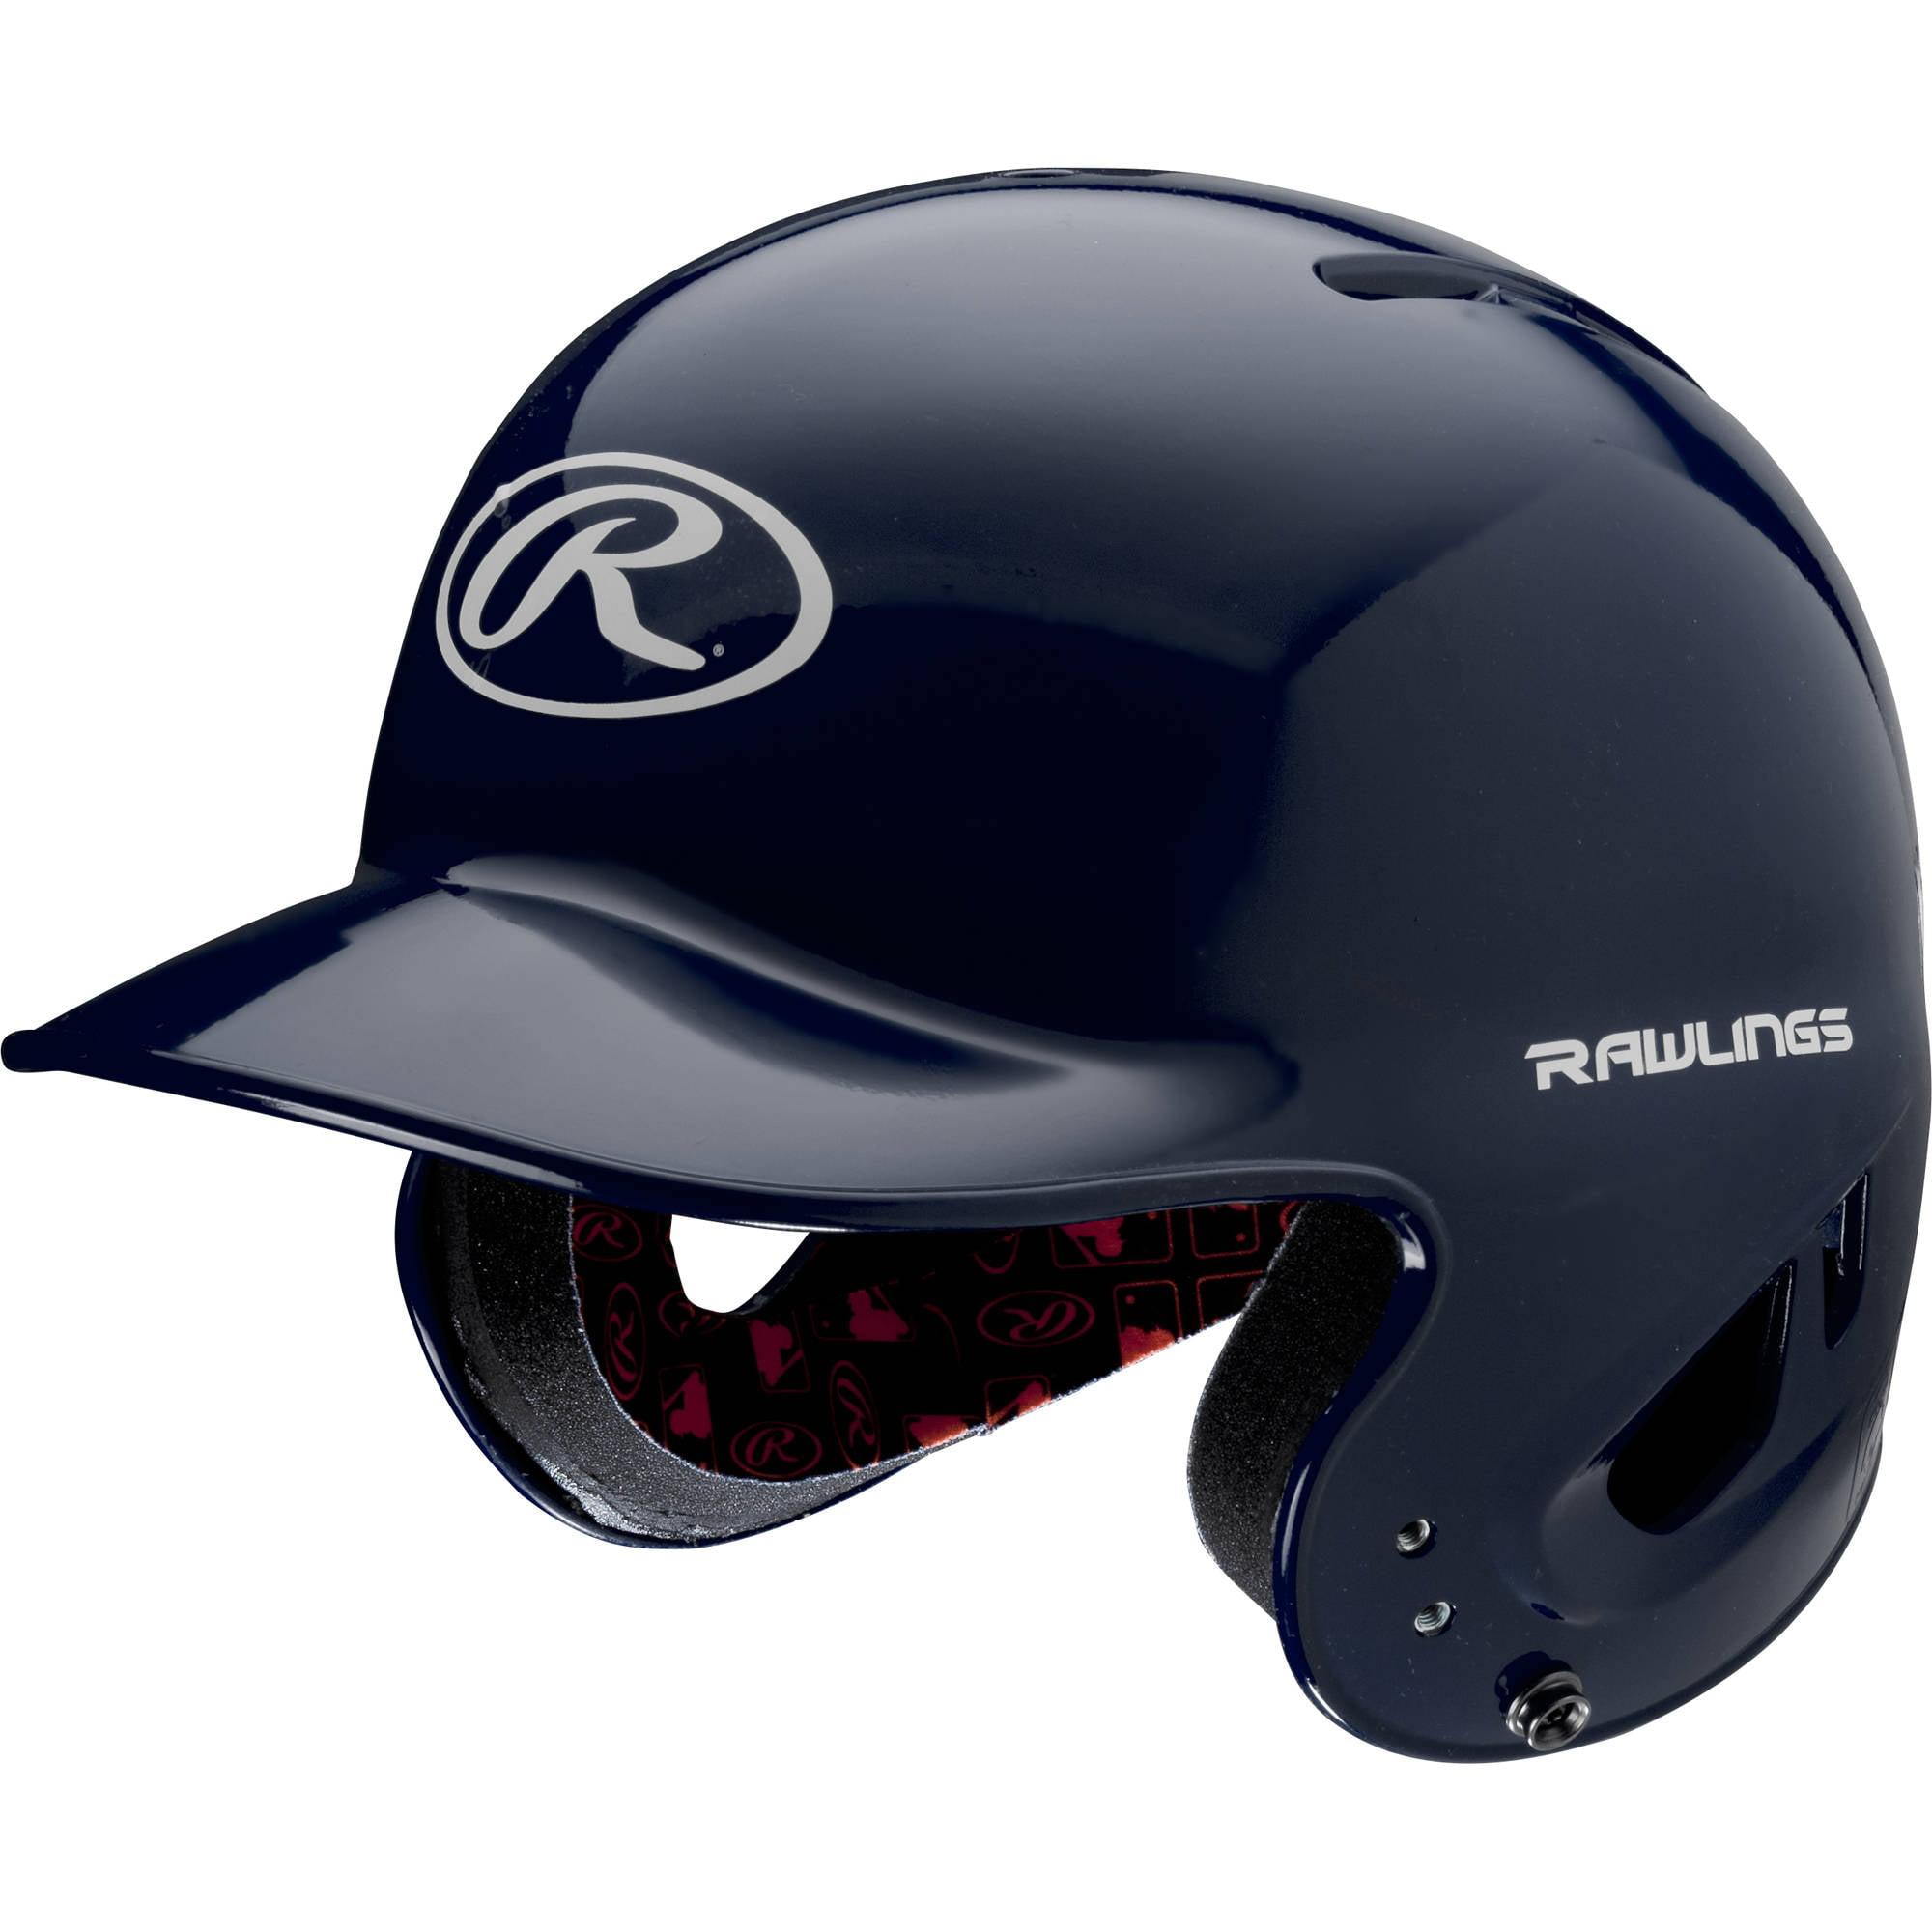 Rawlings MLB Inspired T-Ball Helmet, Navy Blue